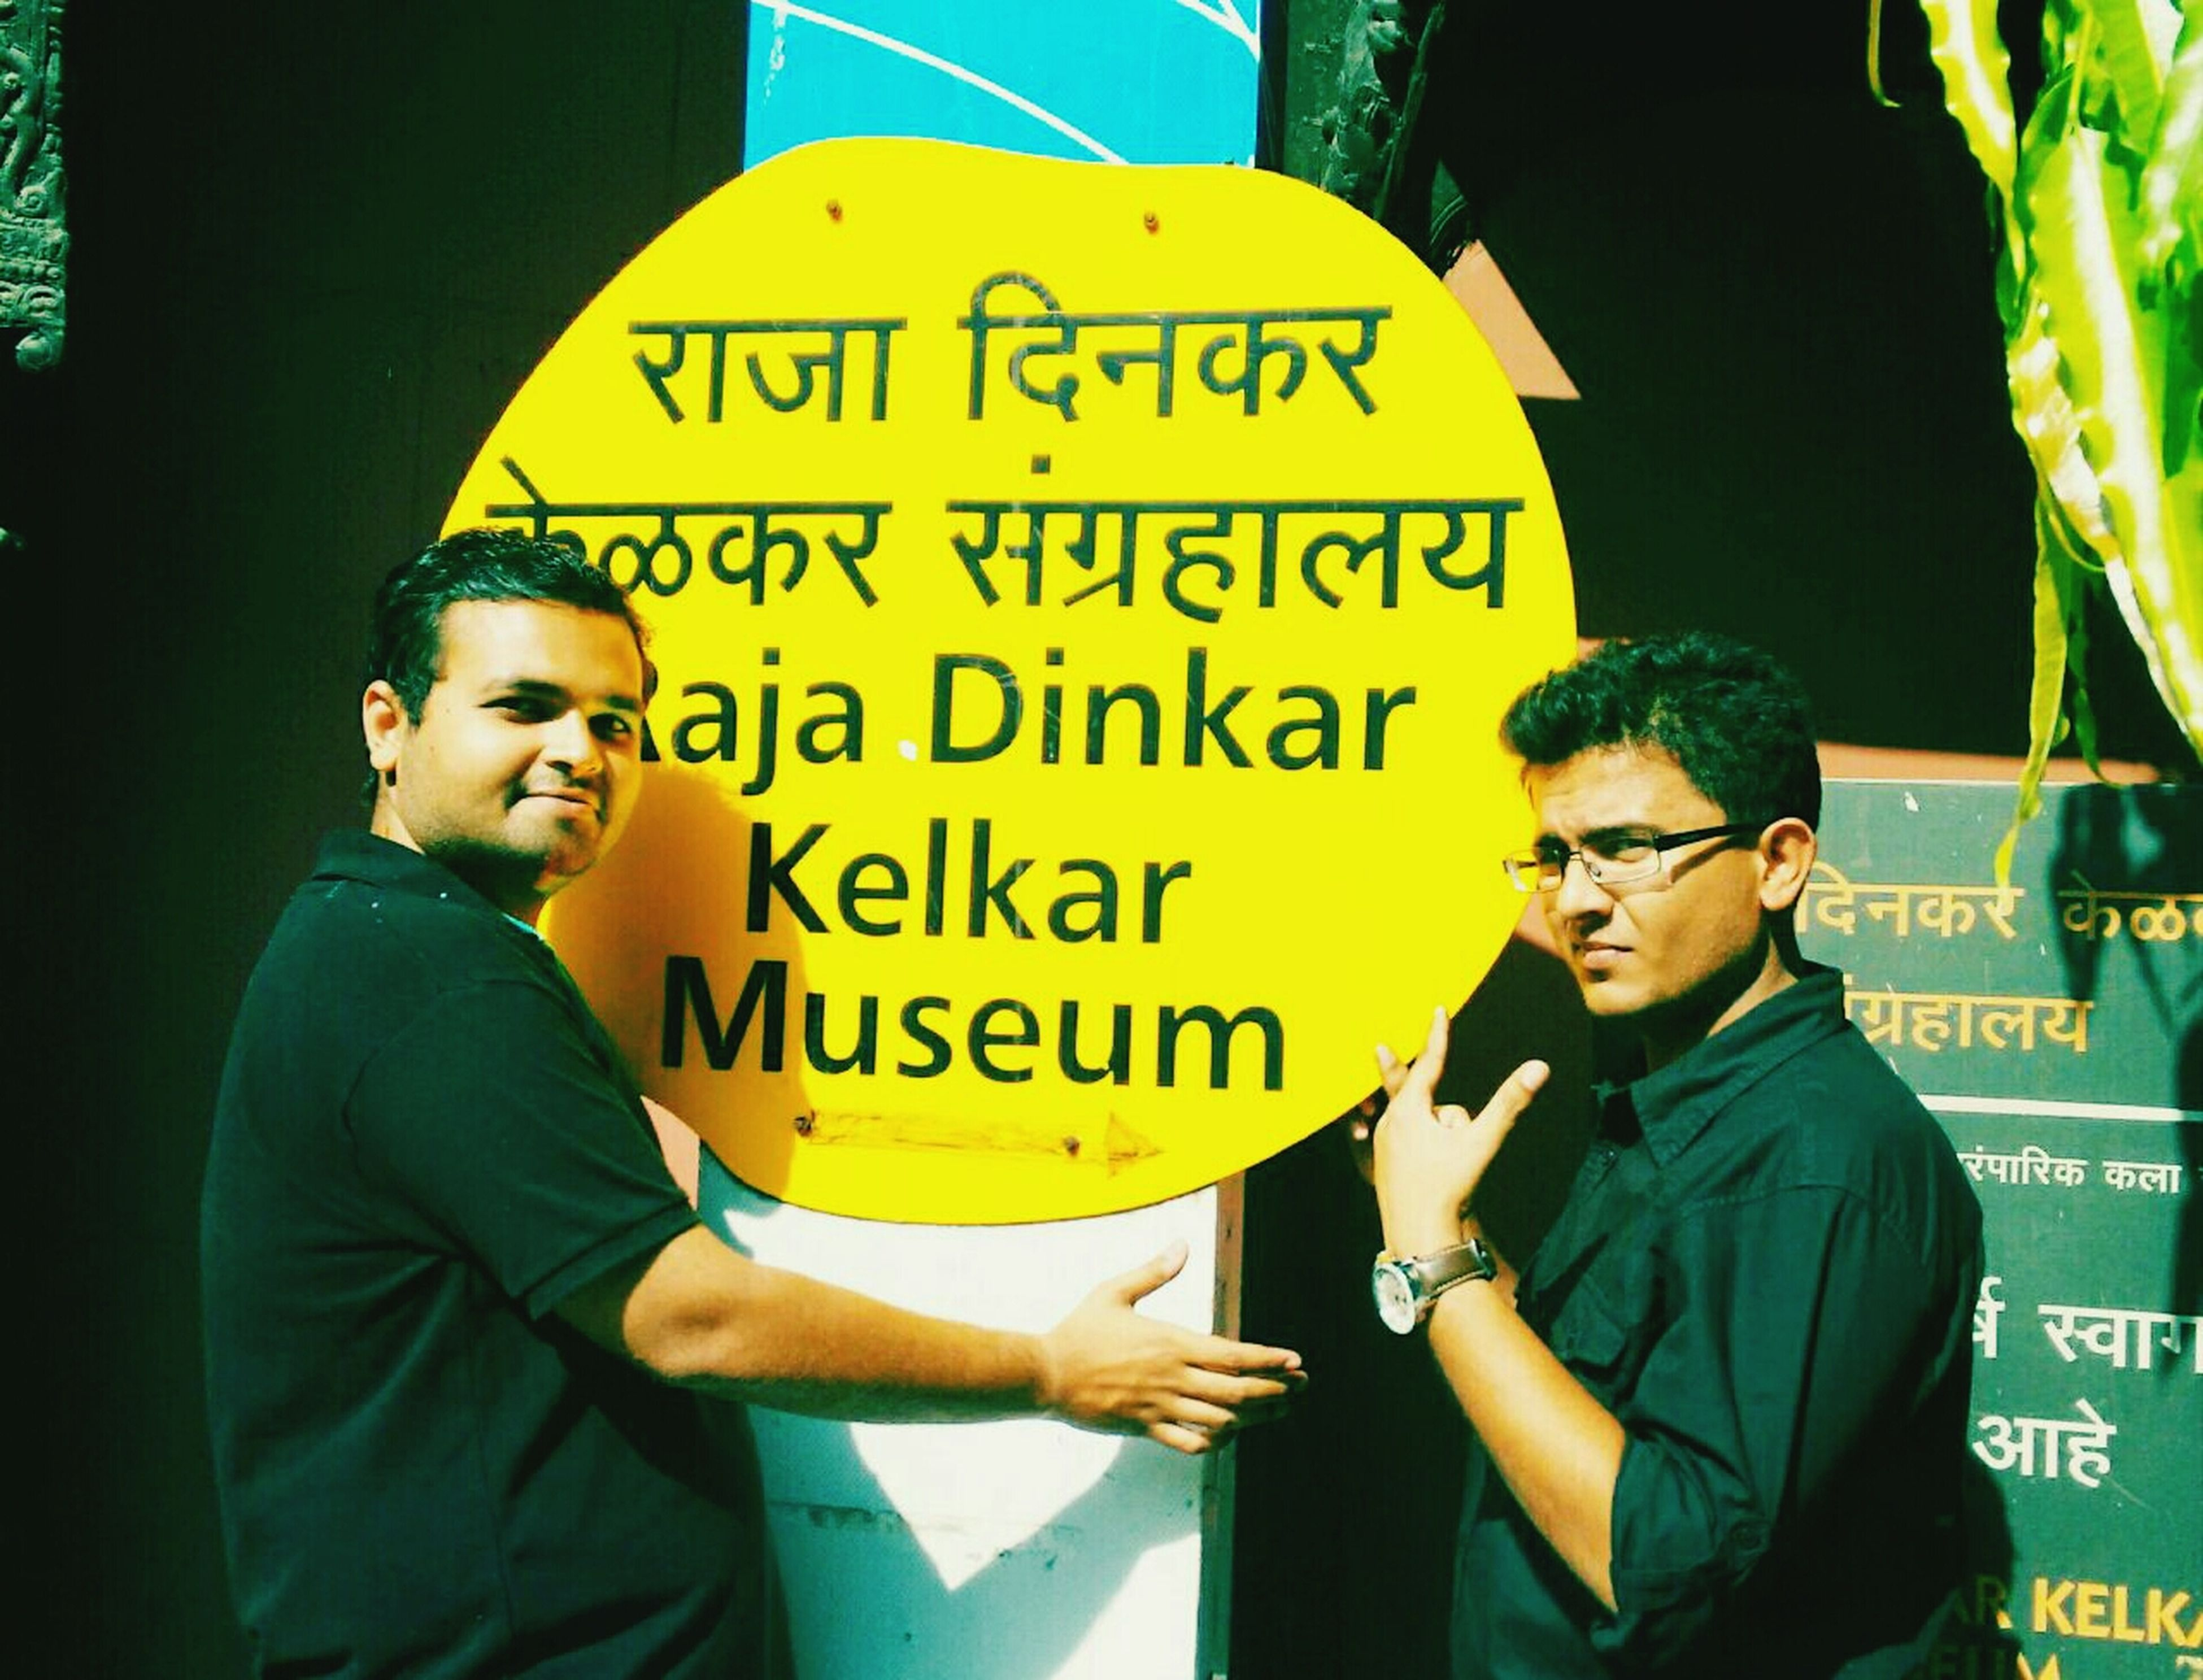 Friends JODIII✨ Pune Kelkarmuseum Connected By Travel